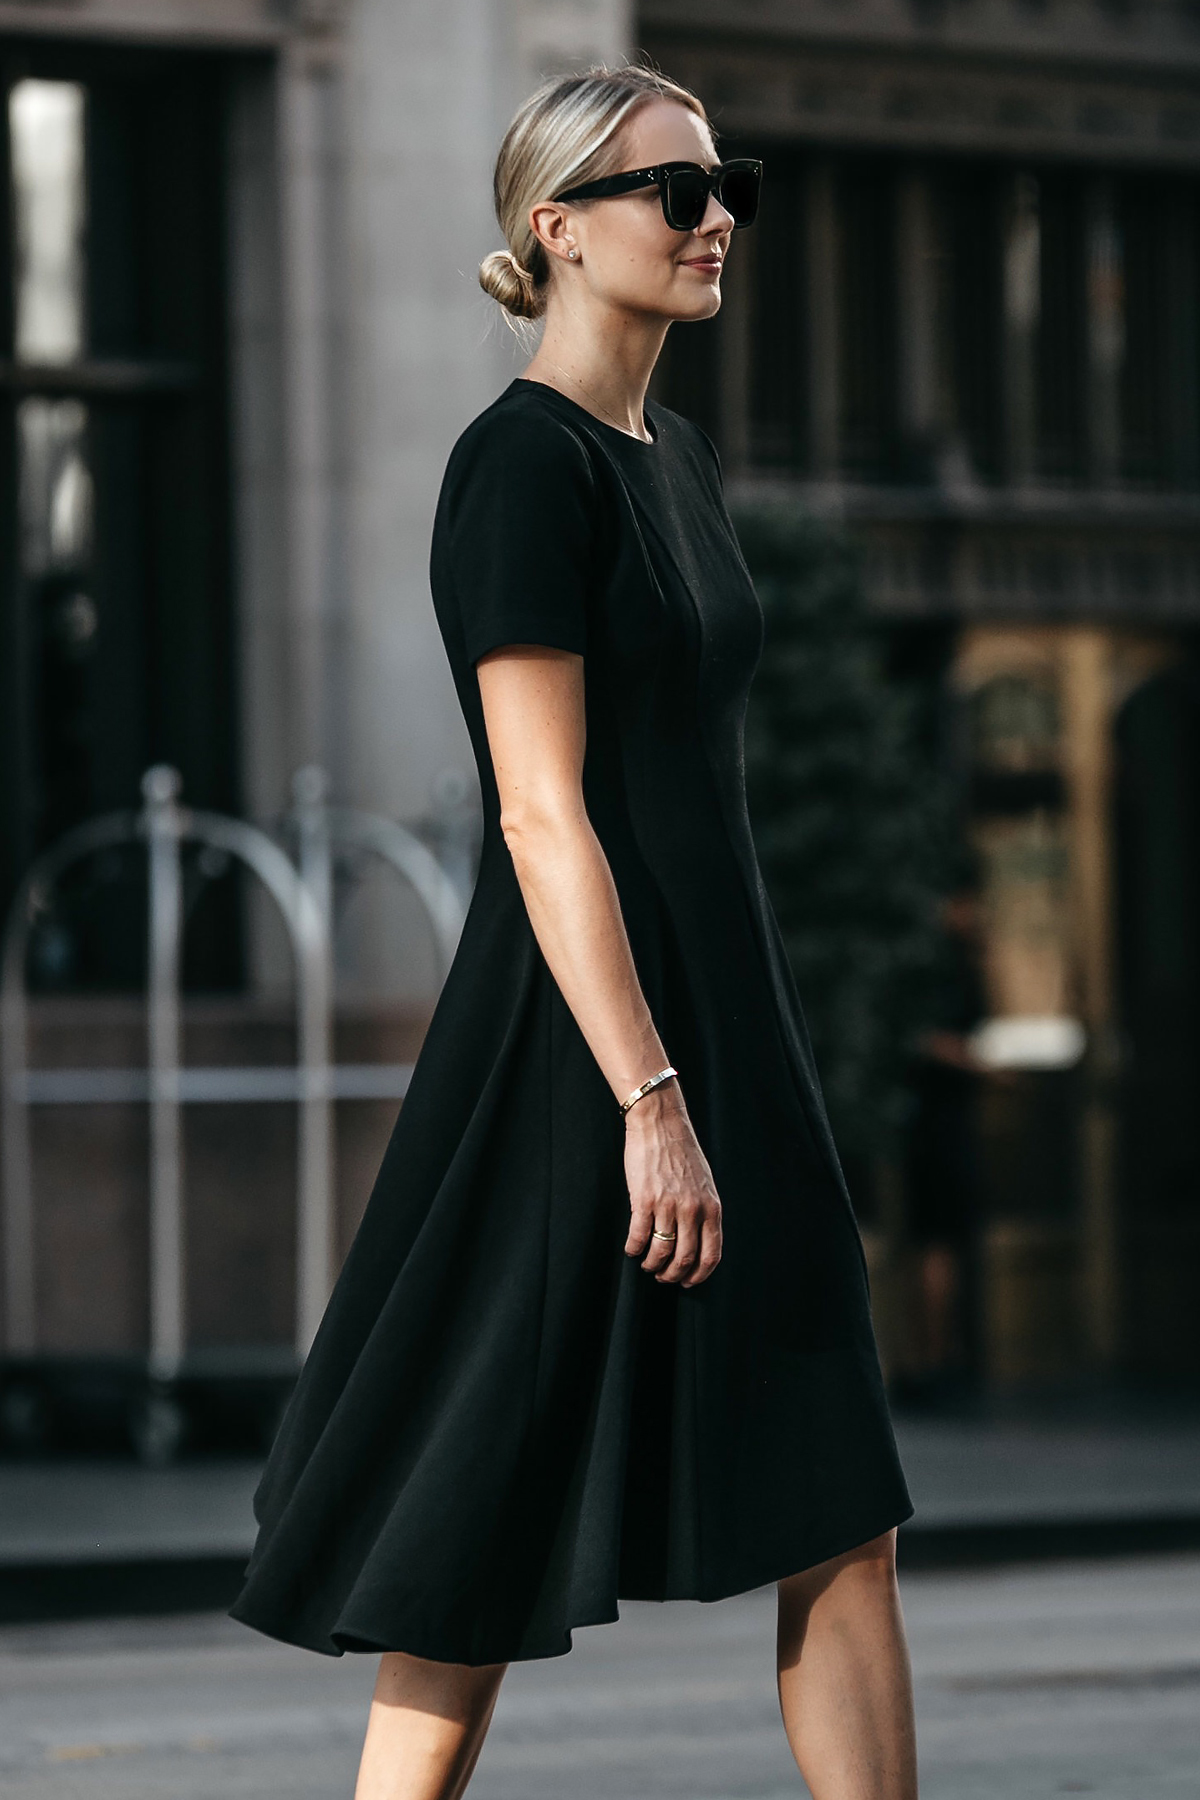 Blonde Woman Wearing Black Halo Asymmetrical Little Black Dress Fashion Jackson Dallas Blogger Fashion Blogger Street Style